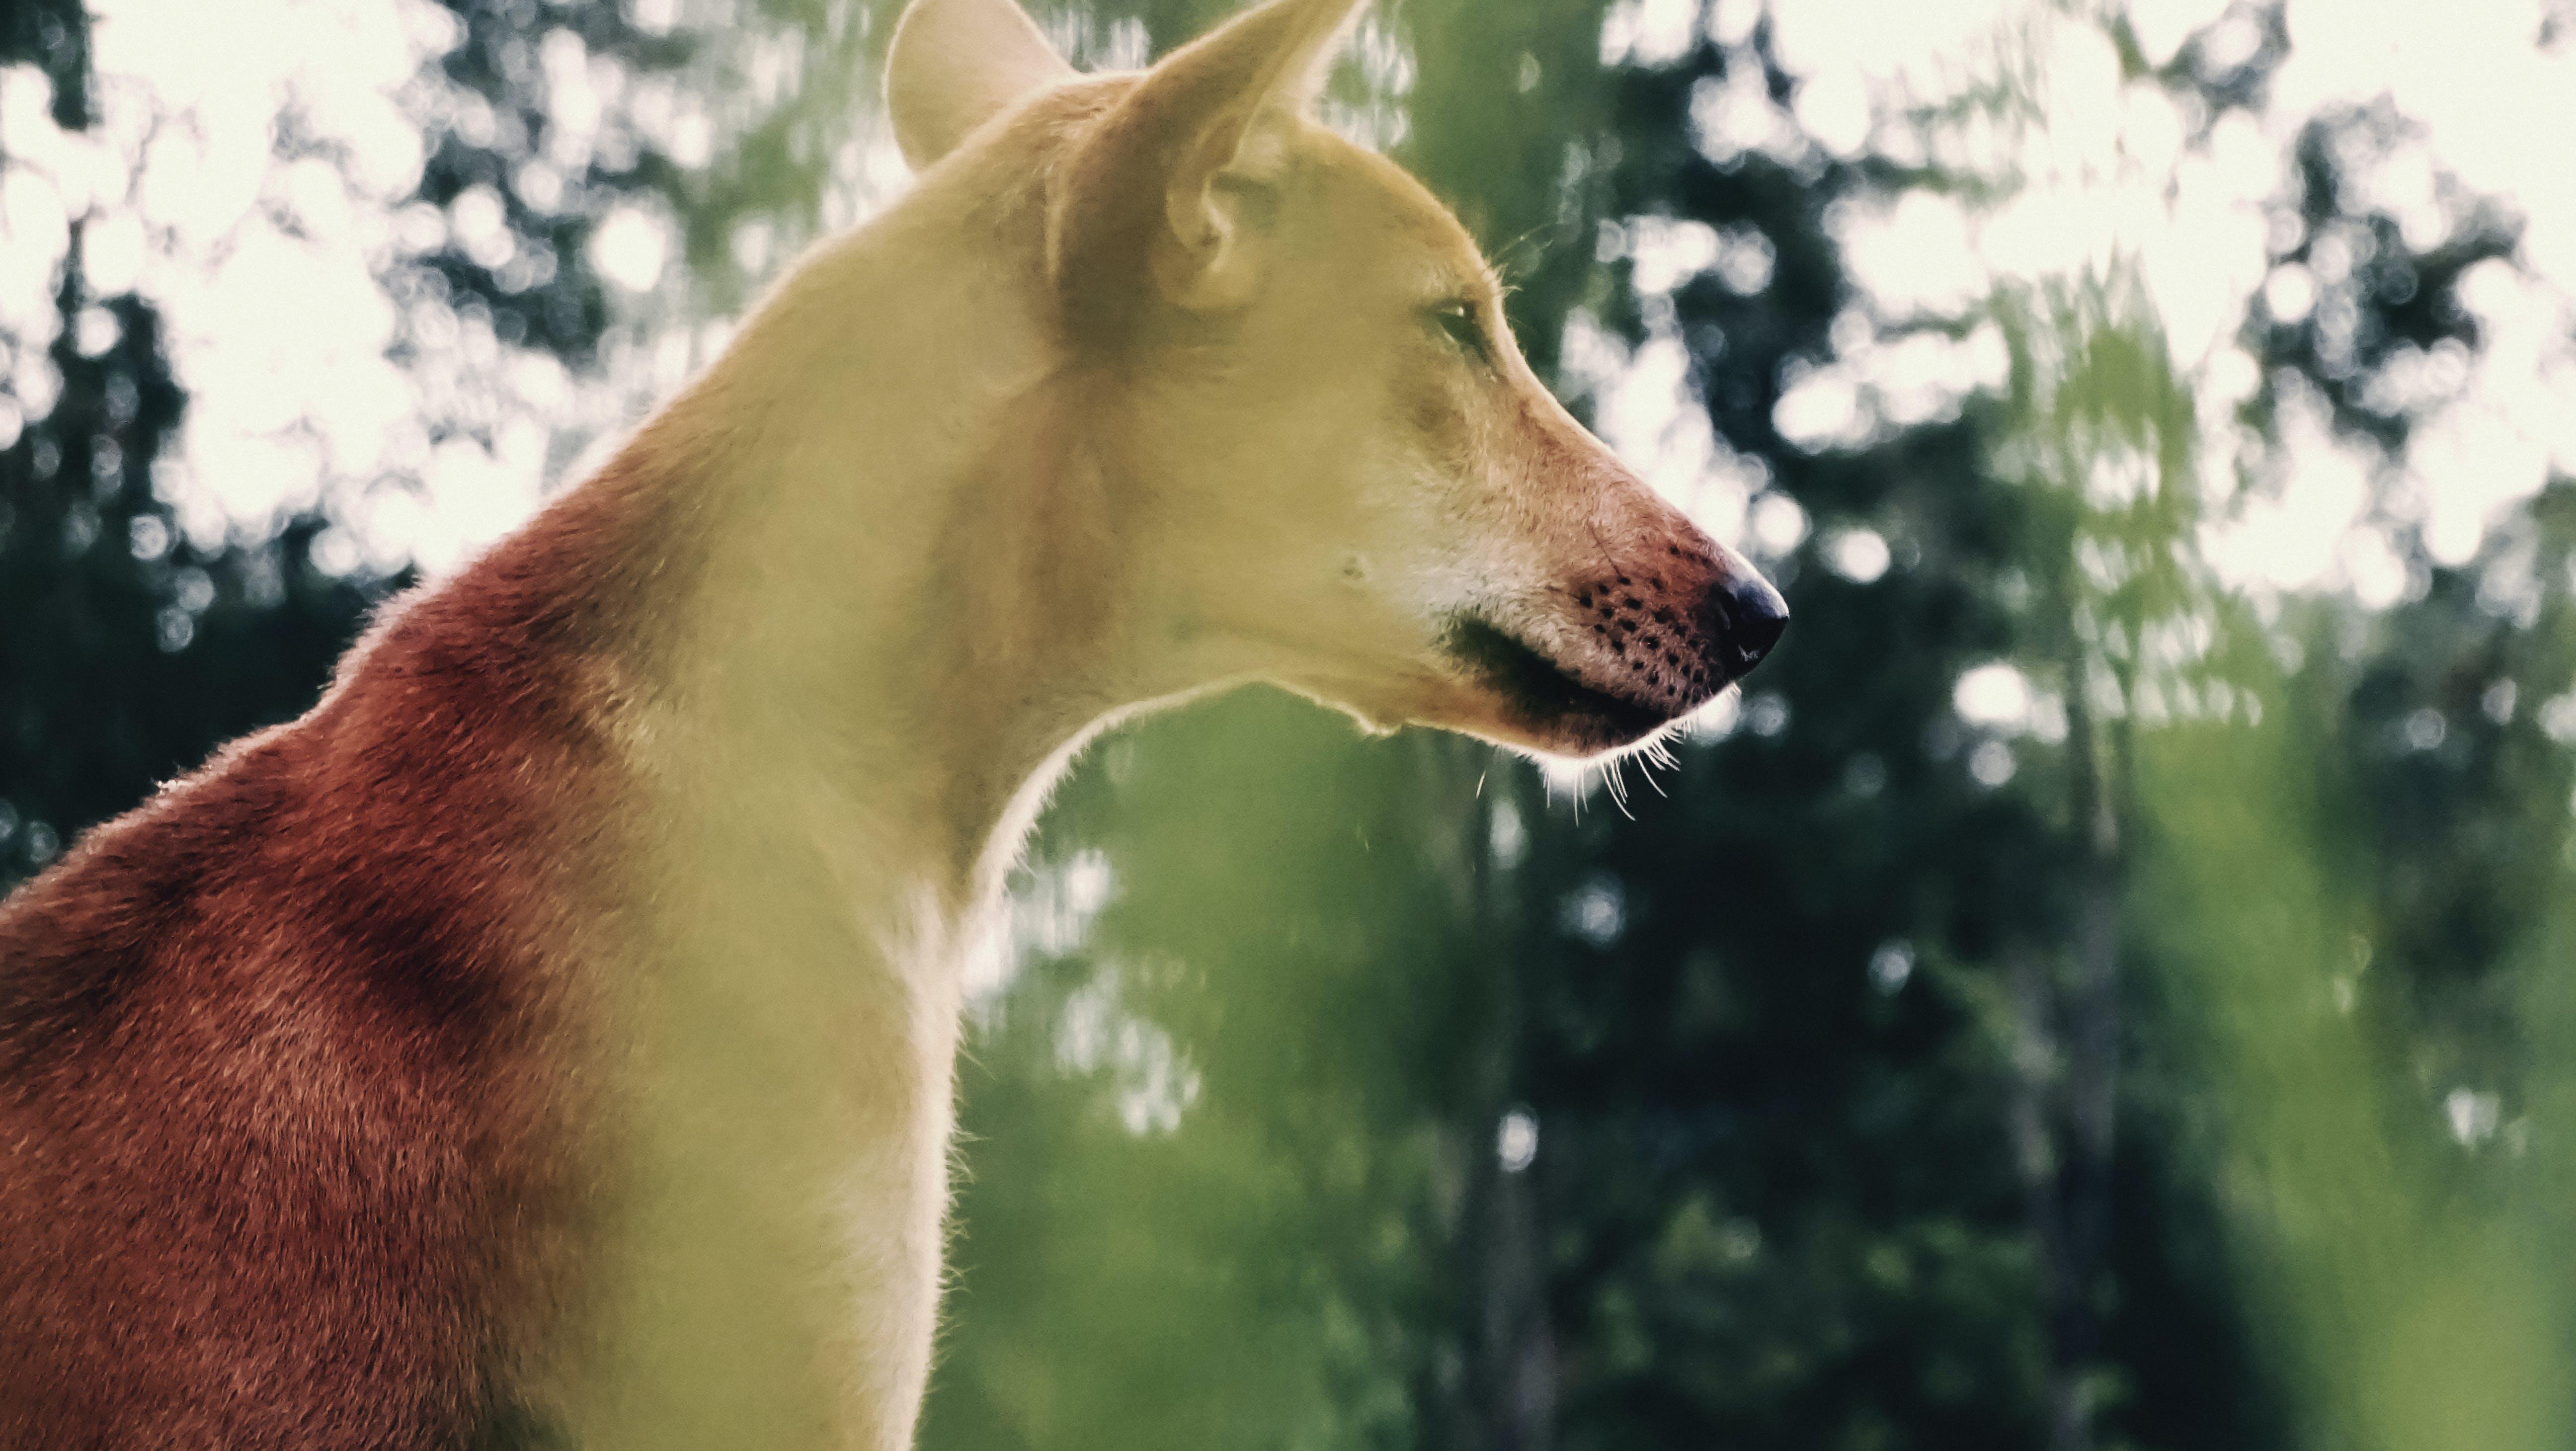 Free stock photo of #wildlife, animal, animal photography, animal portrait